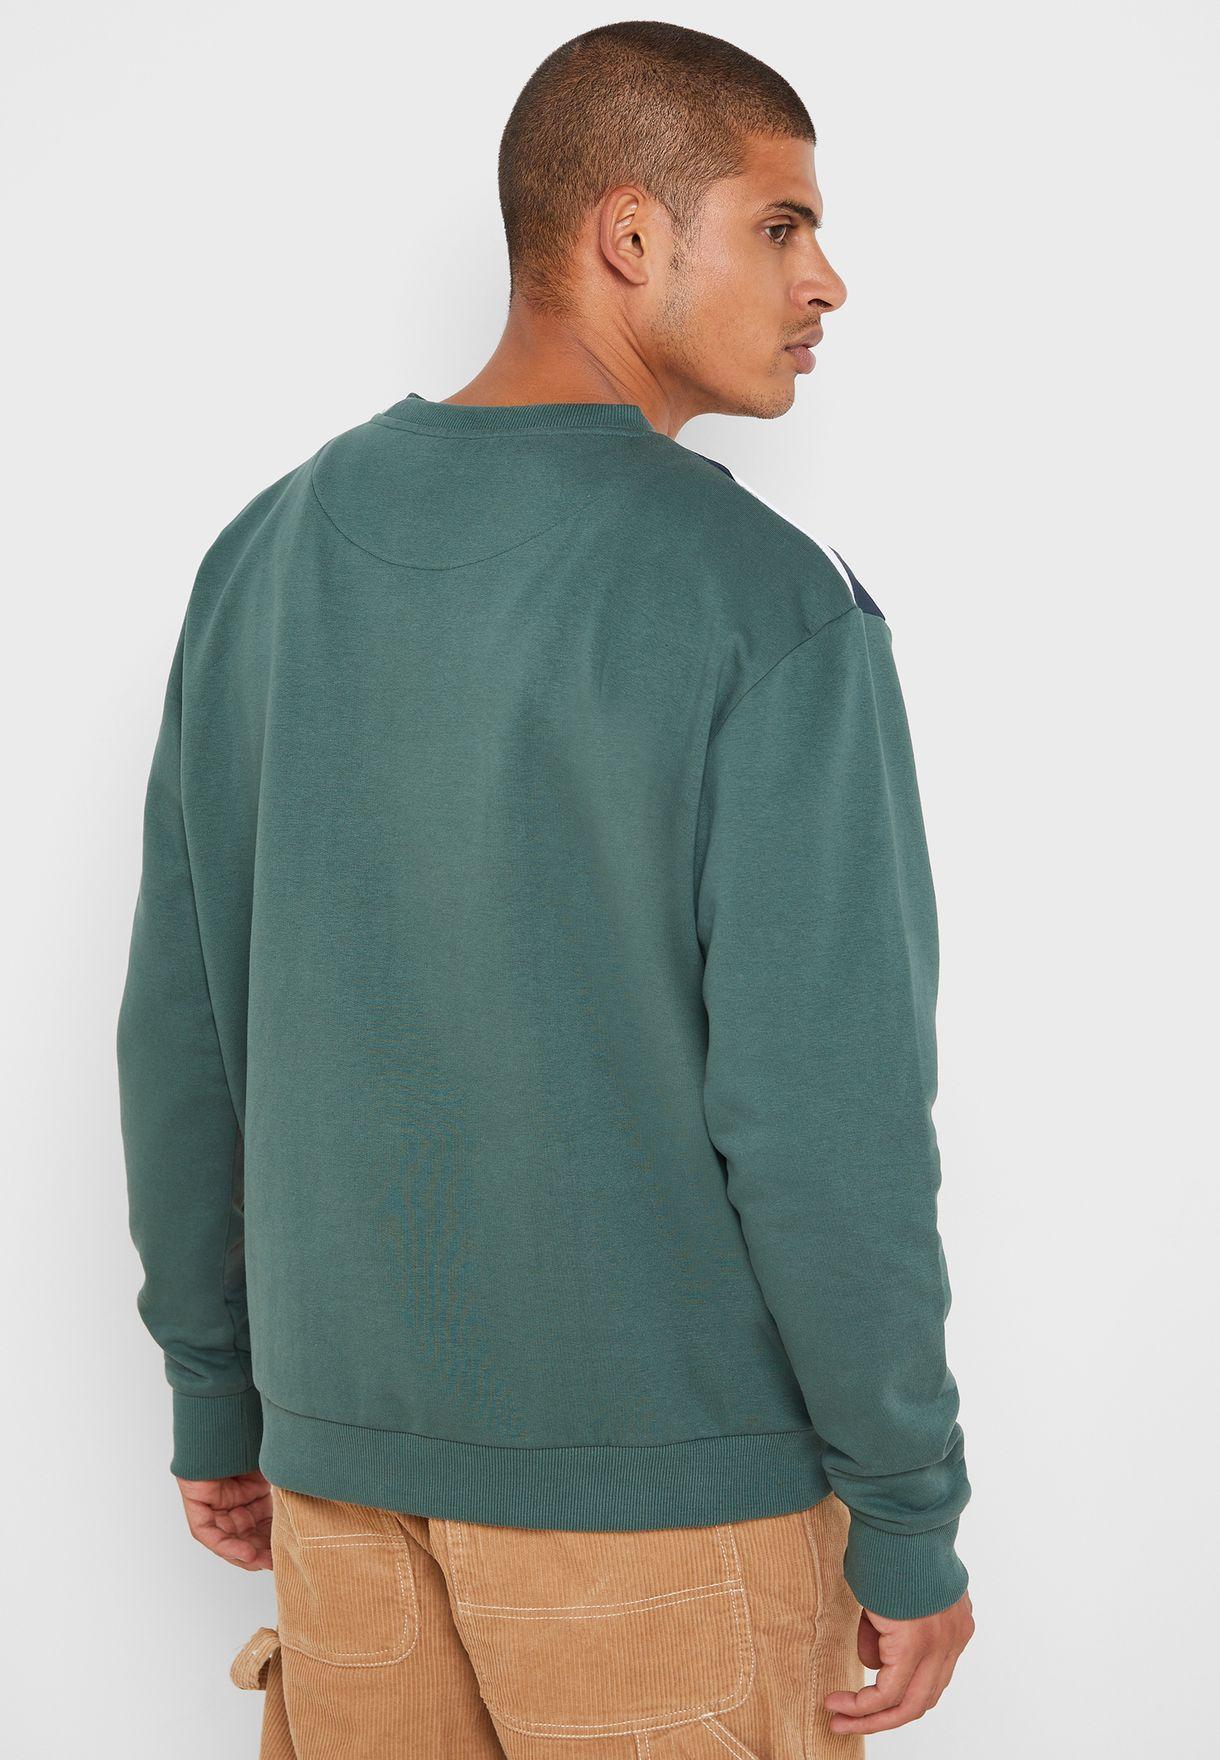 Signature Block Sweatshirt